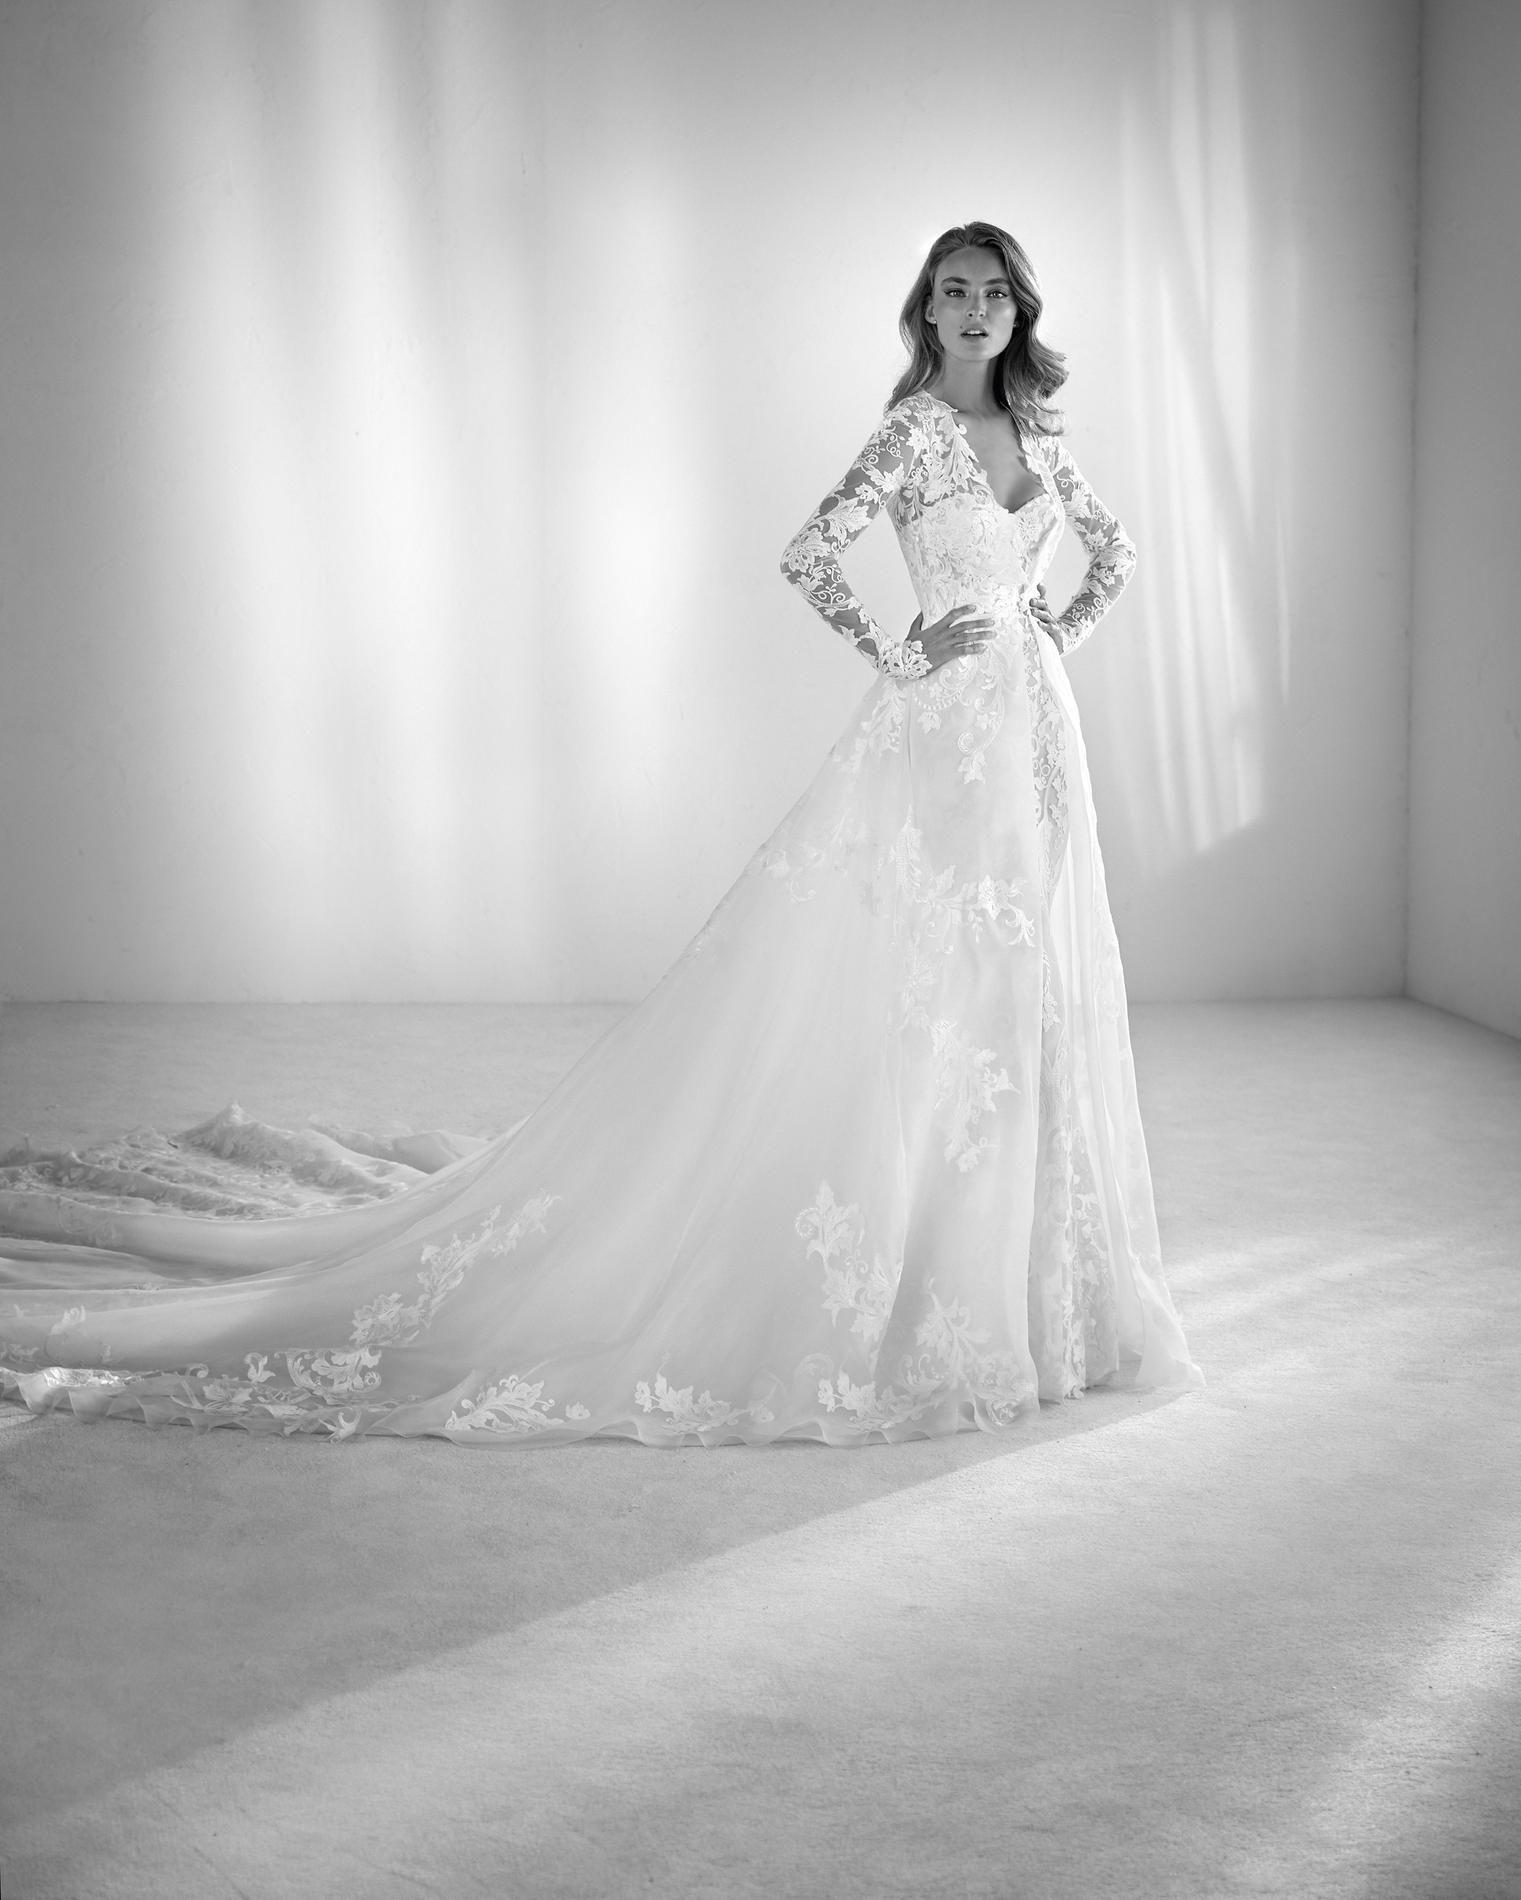 Edwardian wedding dress  Quelle robe de mariée choisir lorsque luon a une forte poitrine   Robe